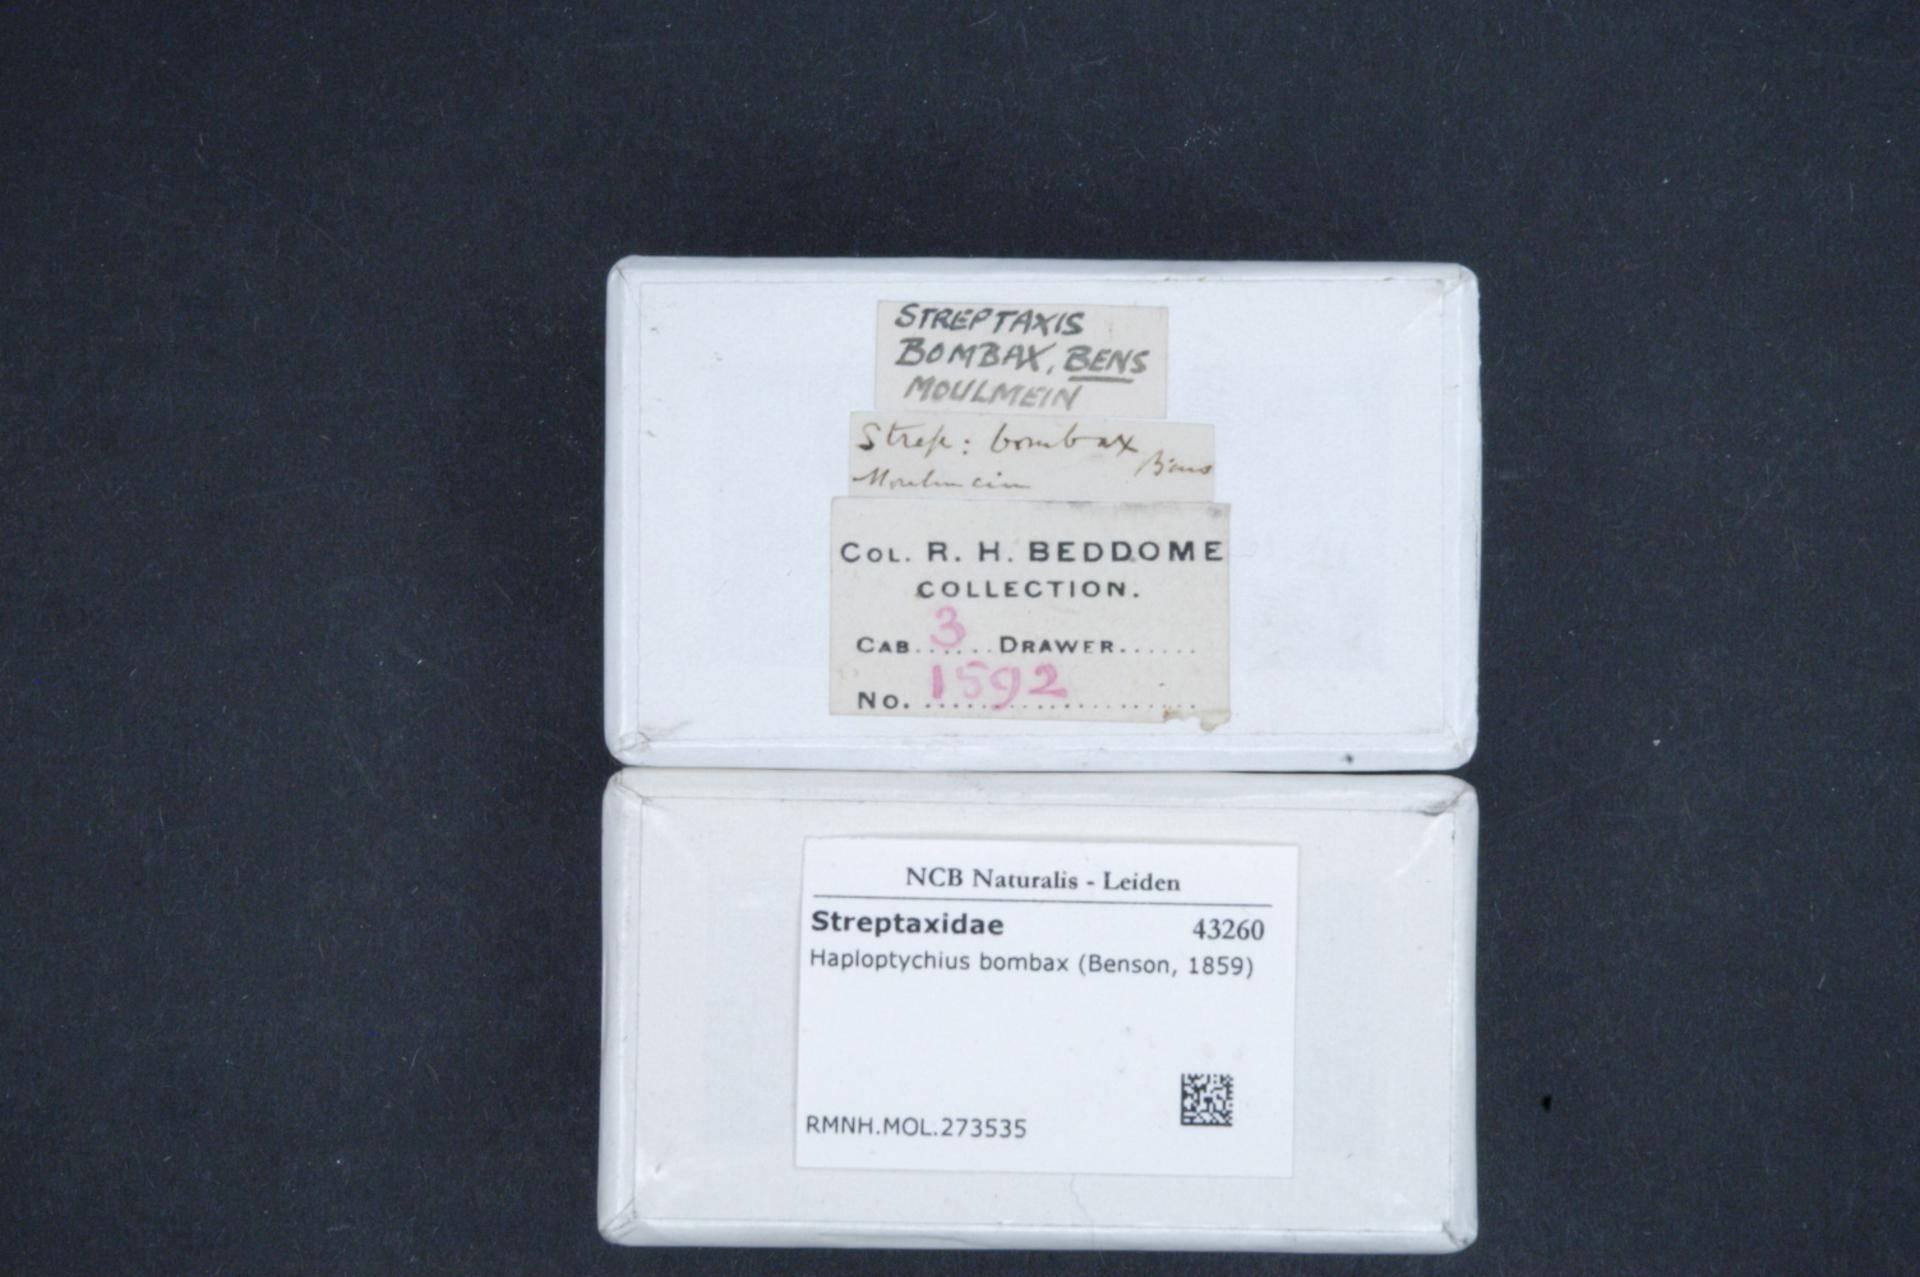 File:Naturalis Biodiversity Center - RMNH MOL 273535 1